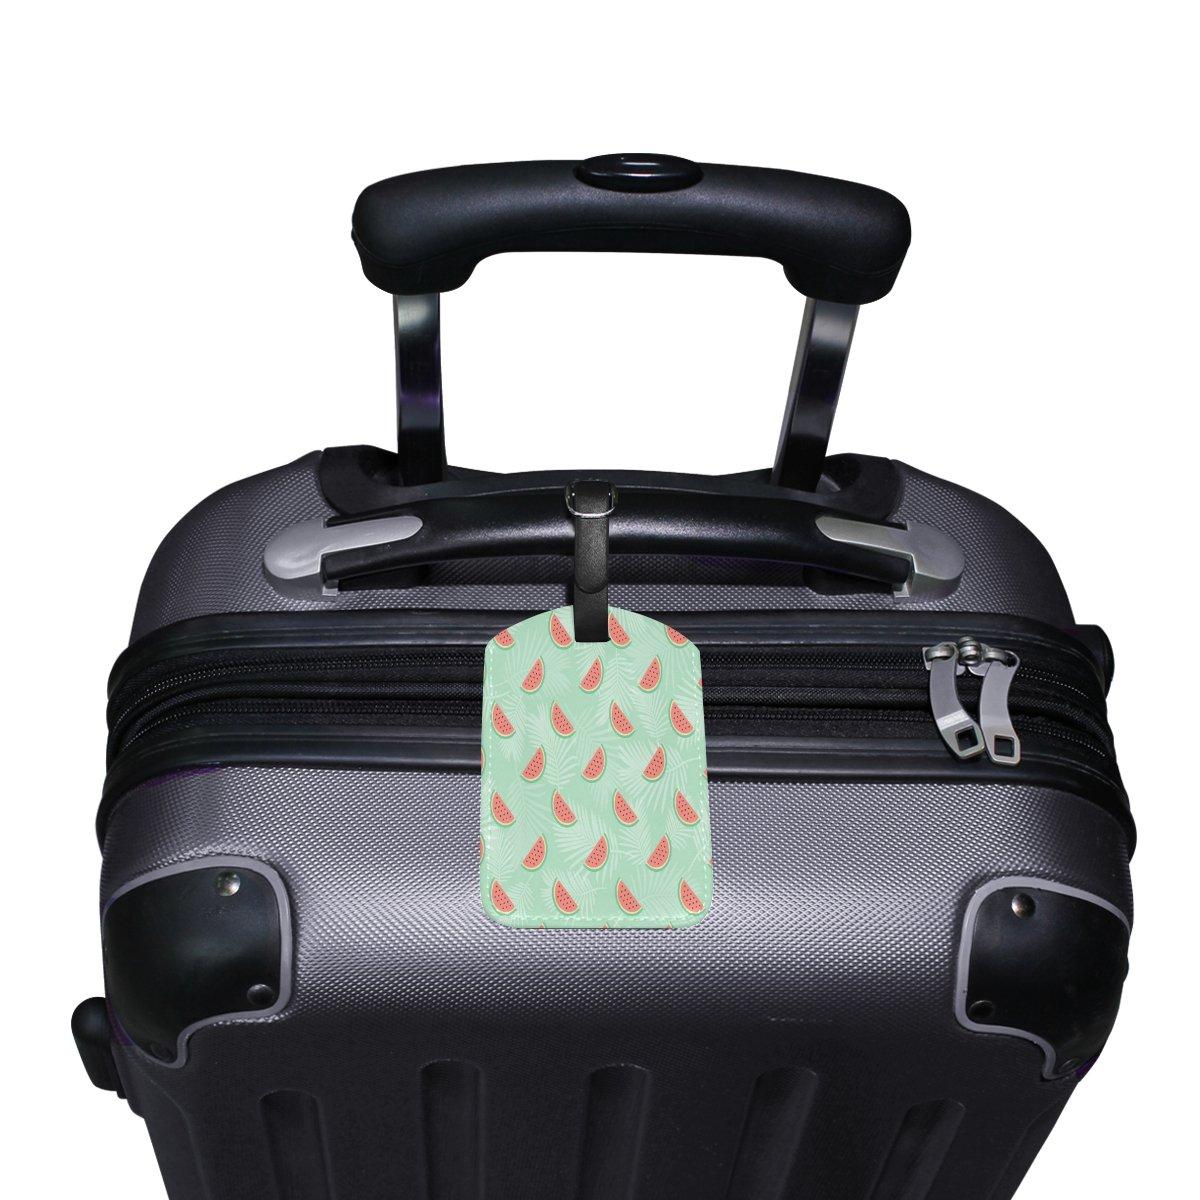 1Pcs Saobao Travel Luggage Tag Watermelon Pattern PU Leather Baggage Suitcase Travel ID Bag Tag